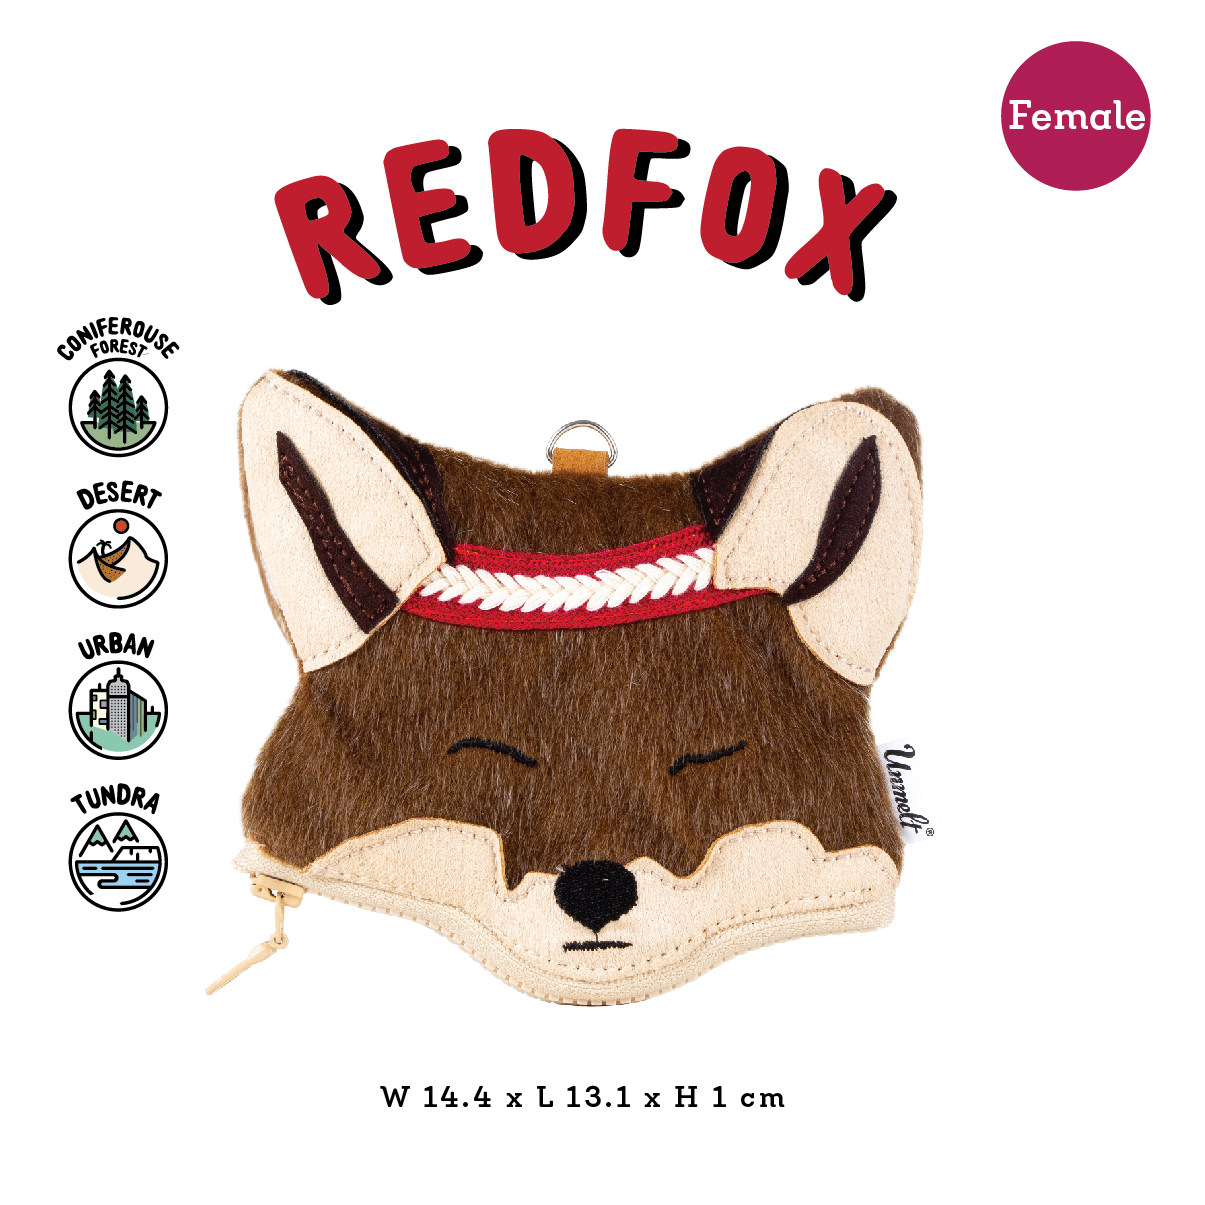 redfox female